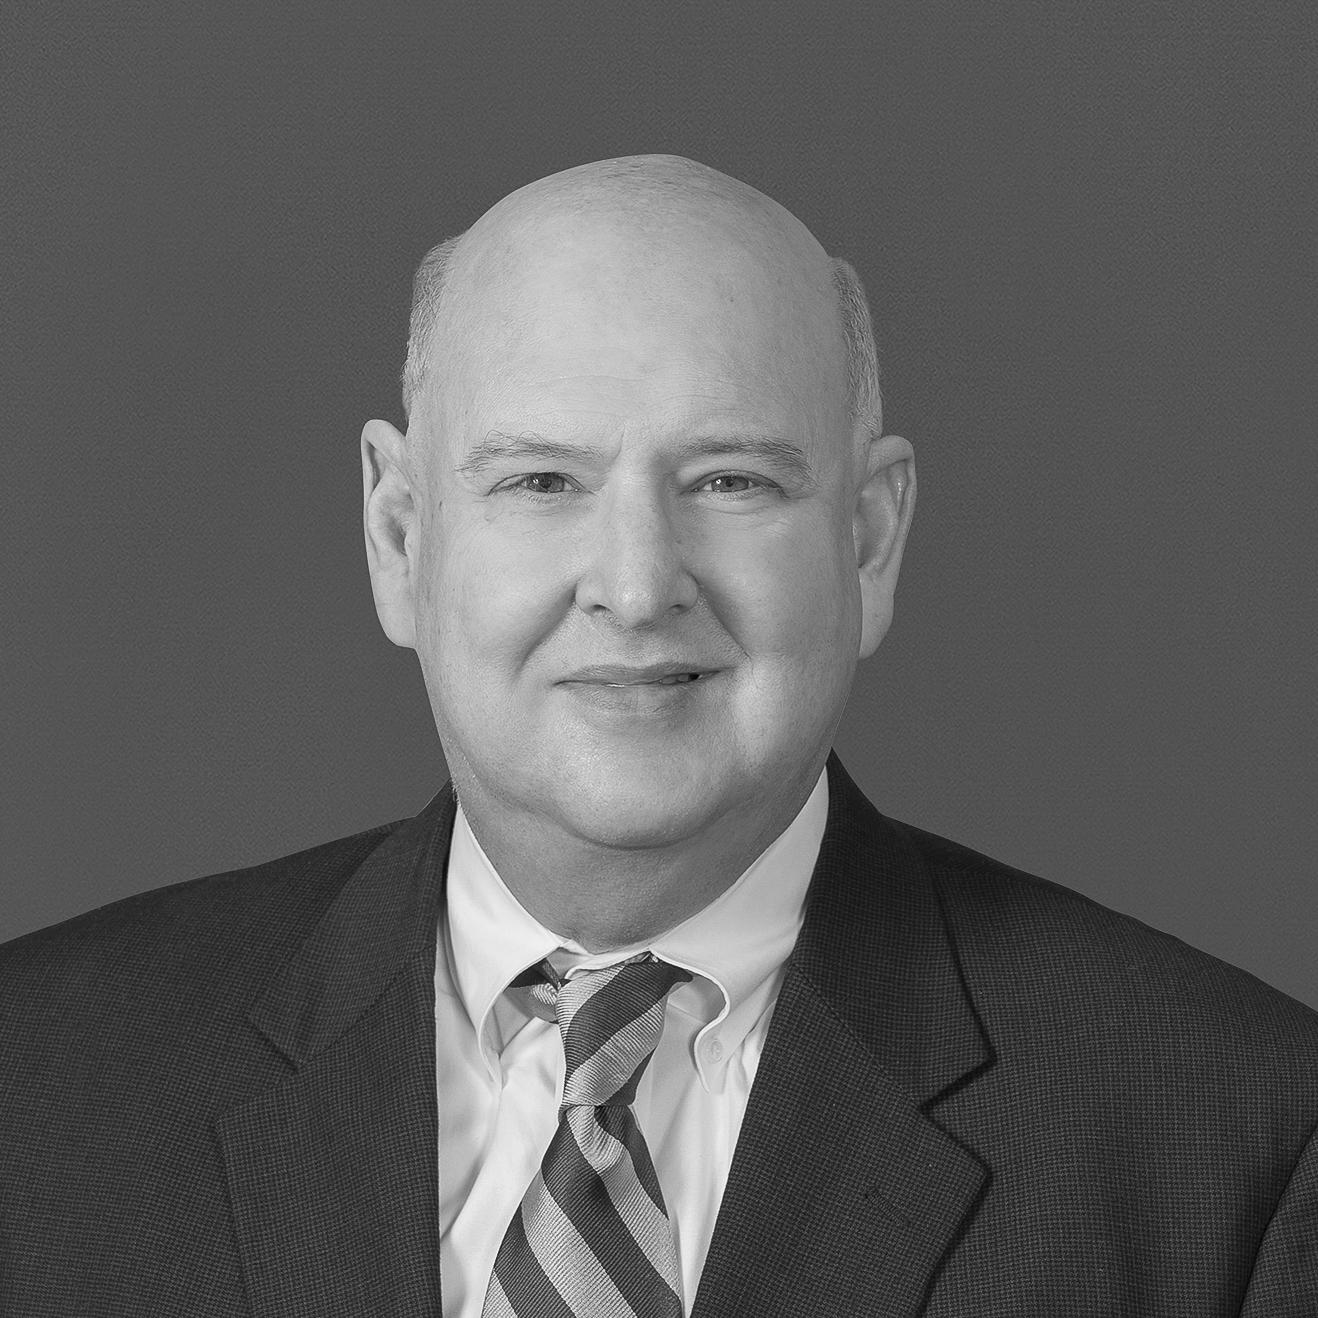 L. Paul Hood, Jr., J.D., LL.M., CFRE, FCEP